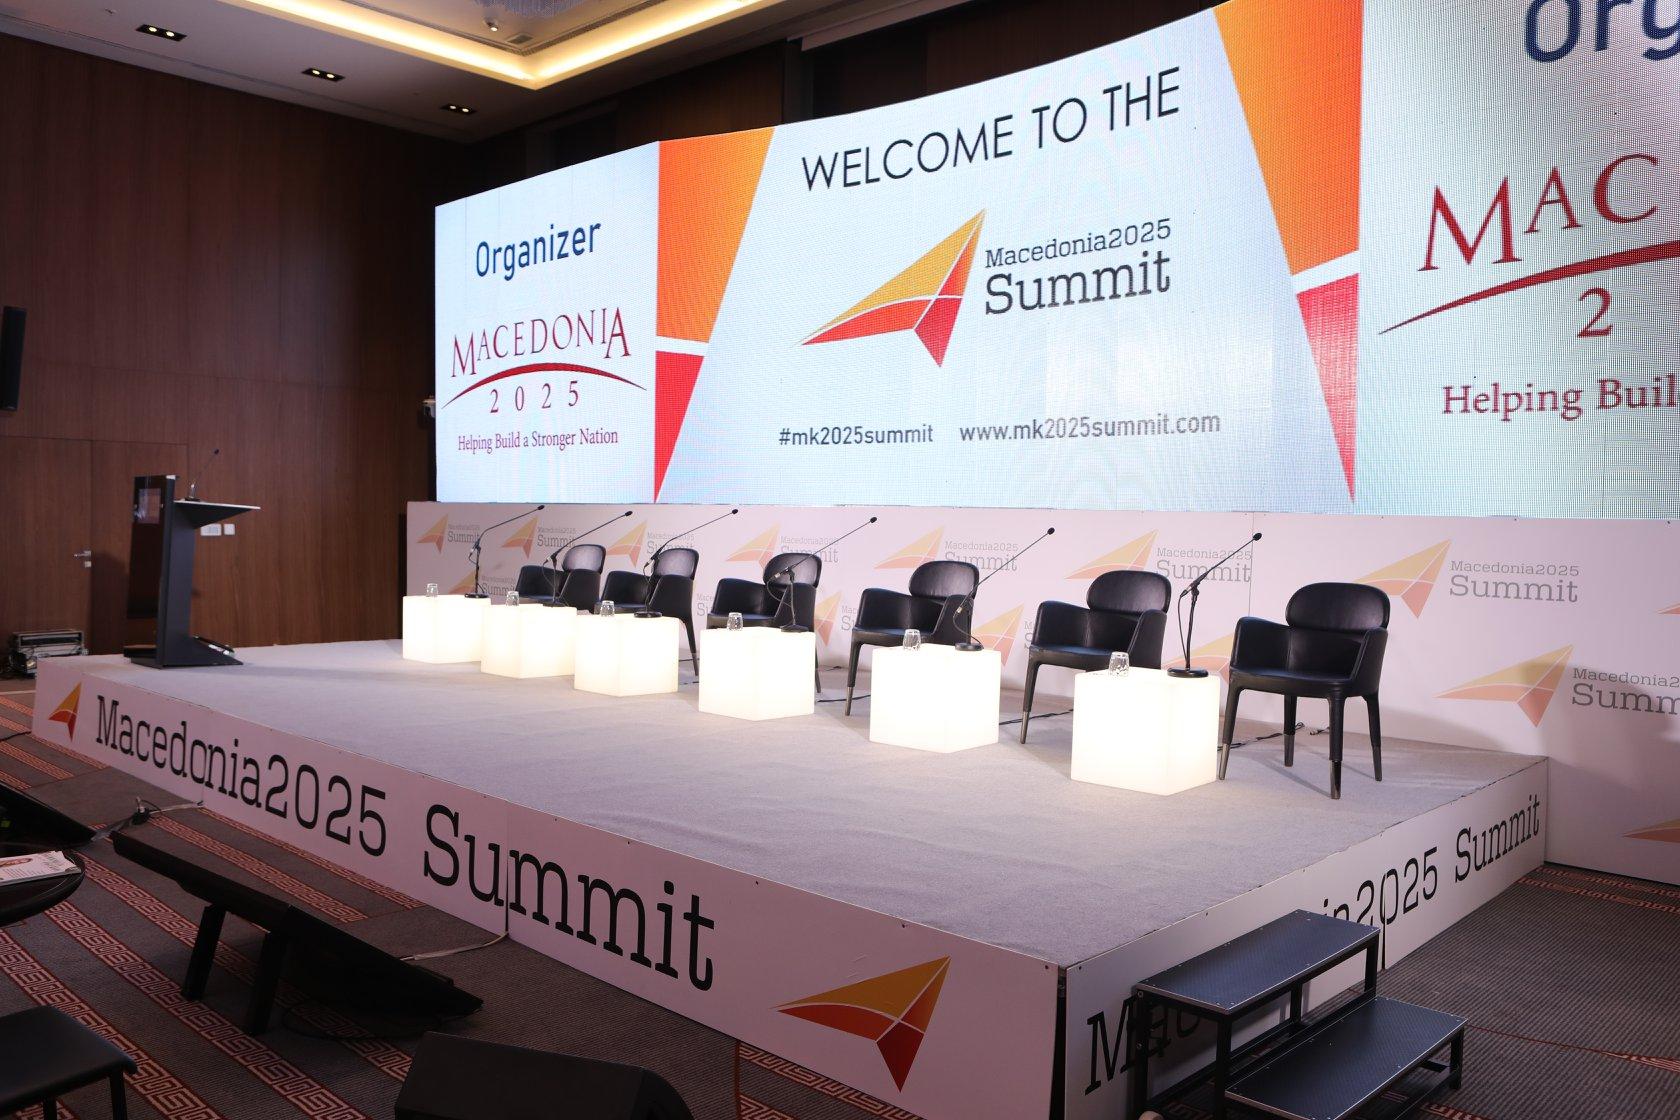 Macedonia 2025 Summit